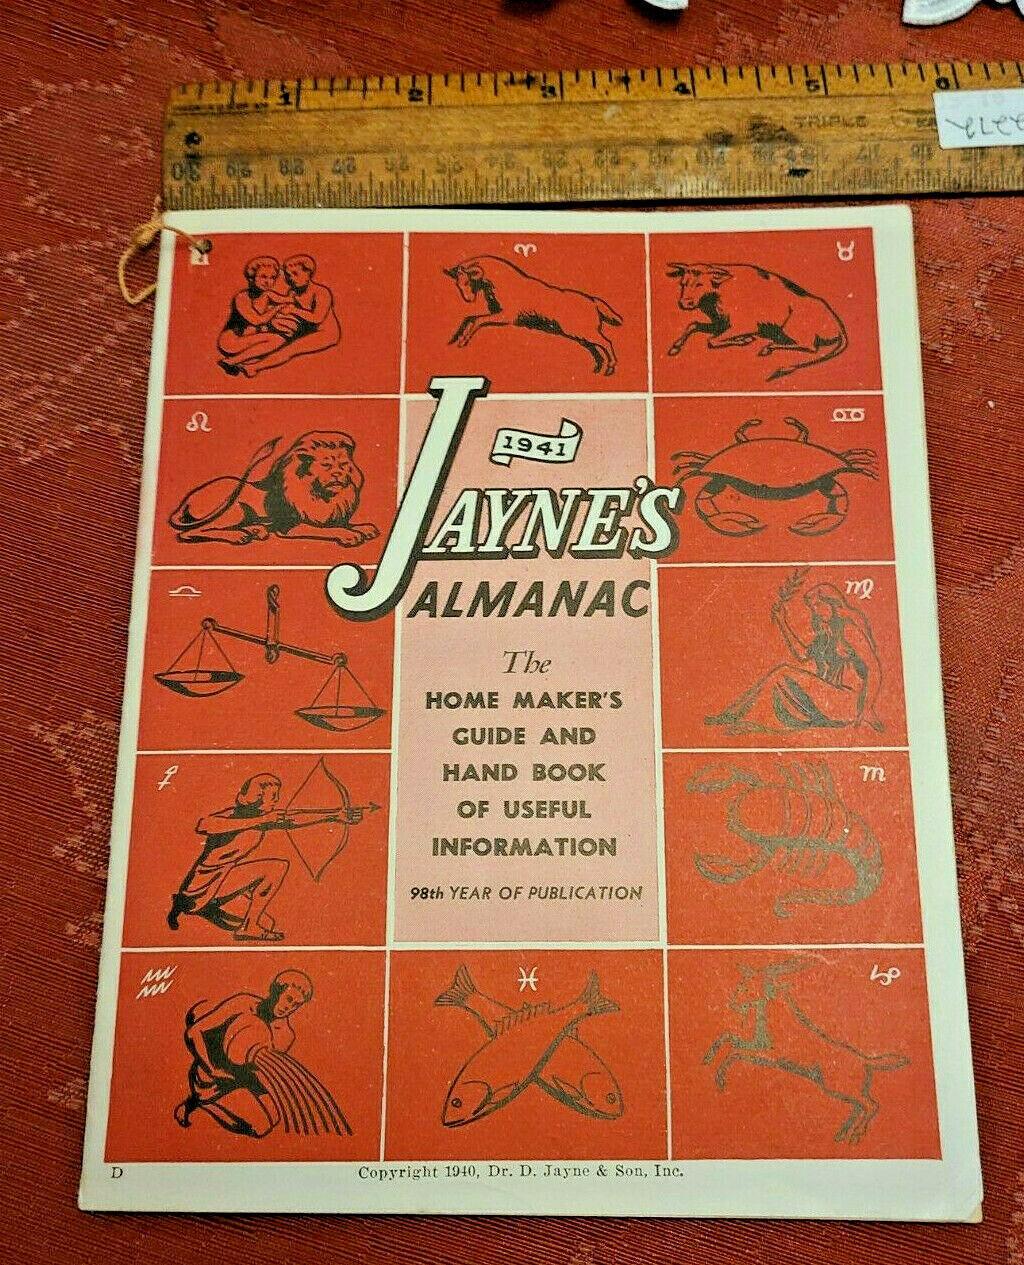 Vintage 1941 Jayne's Almanac Home Maker's Guide & Hand Book Useful Information